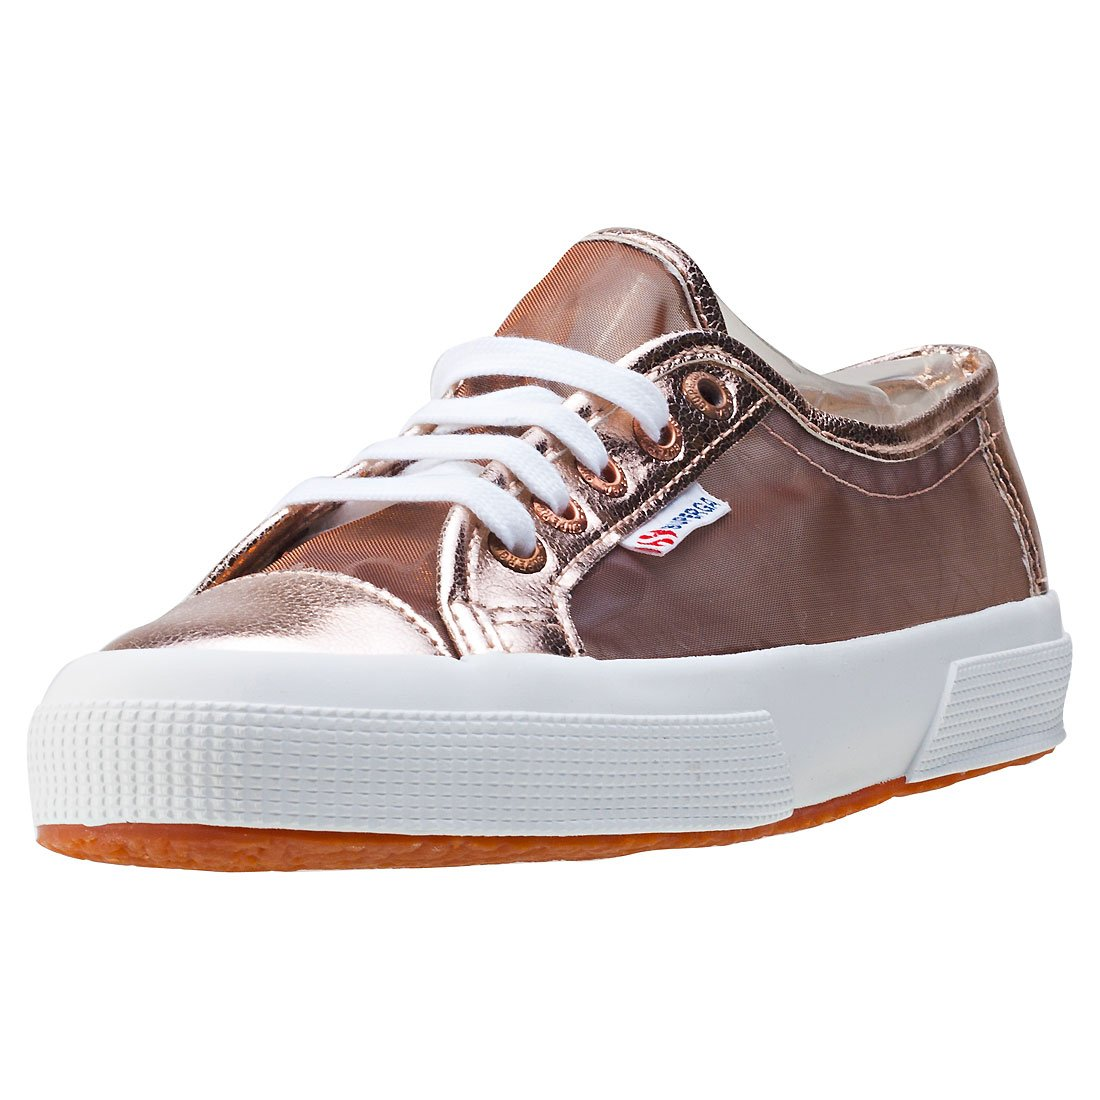 Superga Unisex Erwachsene 2750 Netw Sneaker, Sneaker, Netw Silber, 37 EU  Amazon ... 982f11